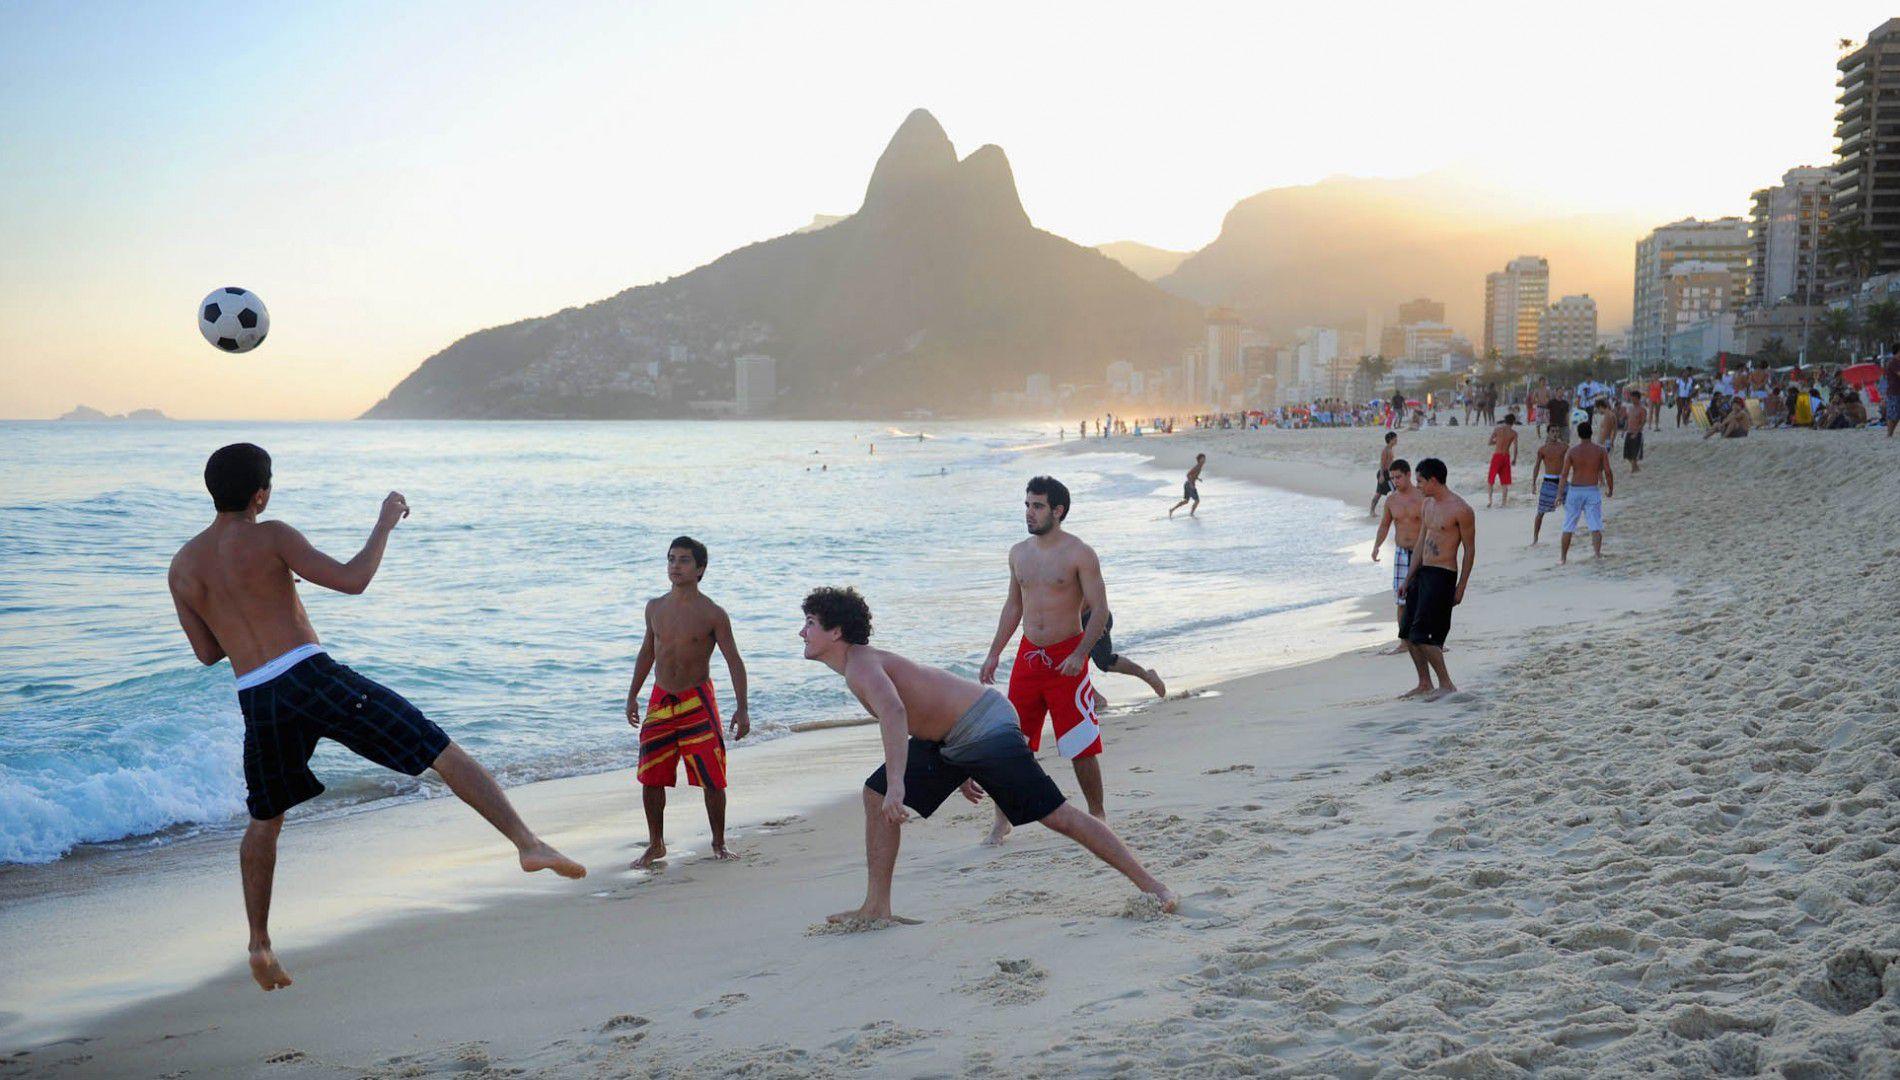 Ipanema-beach-Brazil-119997272-1900x1080_c